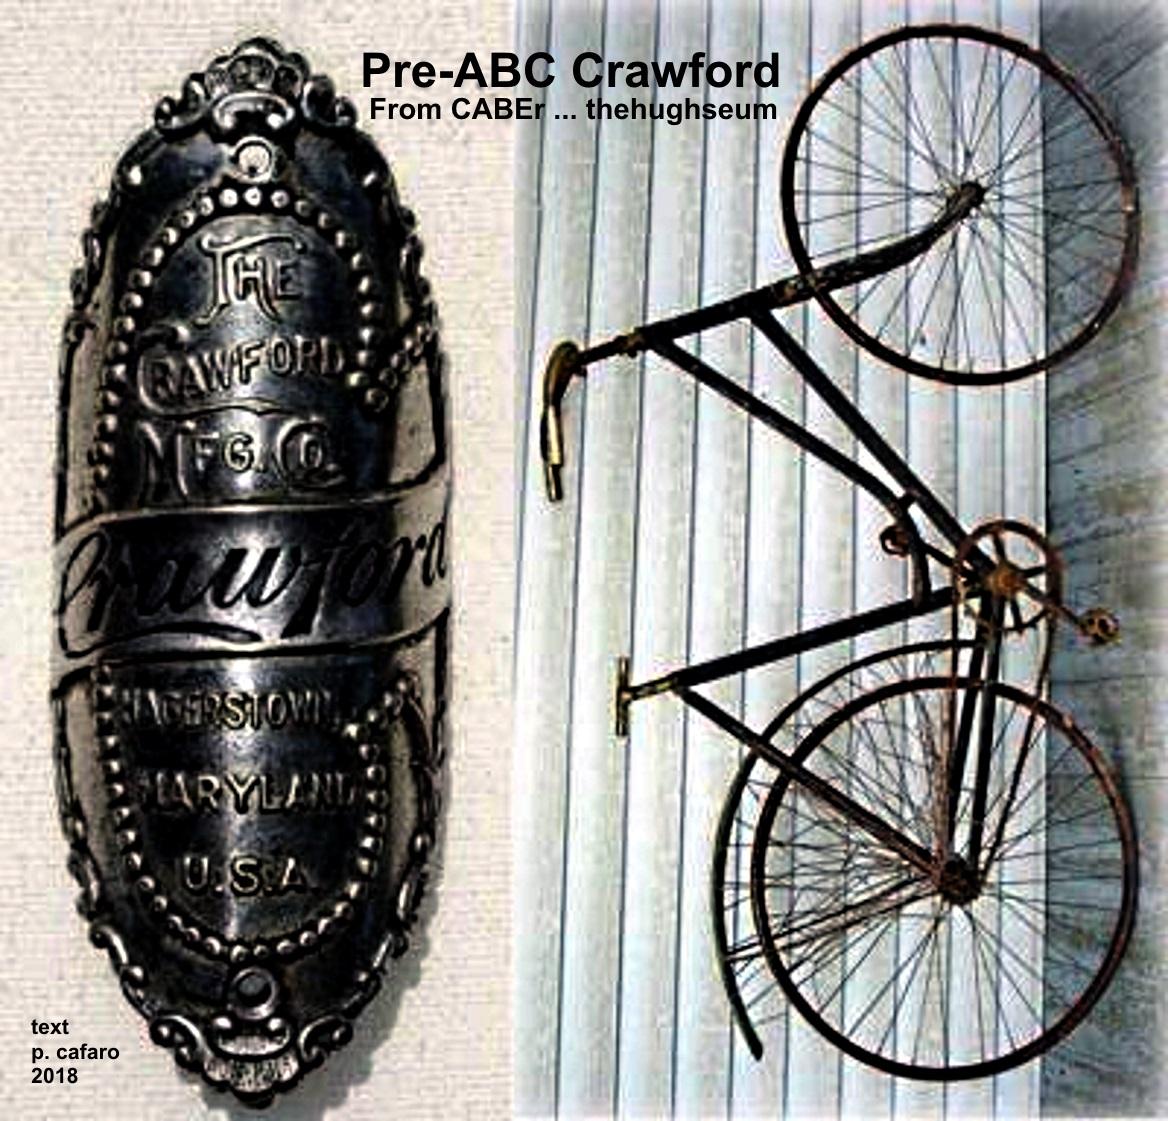 1_ba2d6c23e1a8f52350c46eb699108cdf  crawford 1890's.jpg